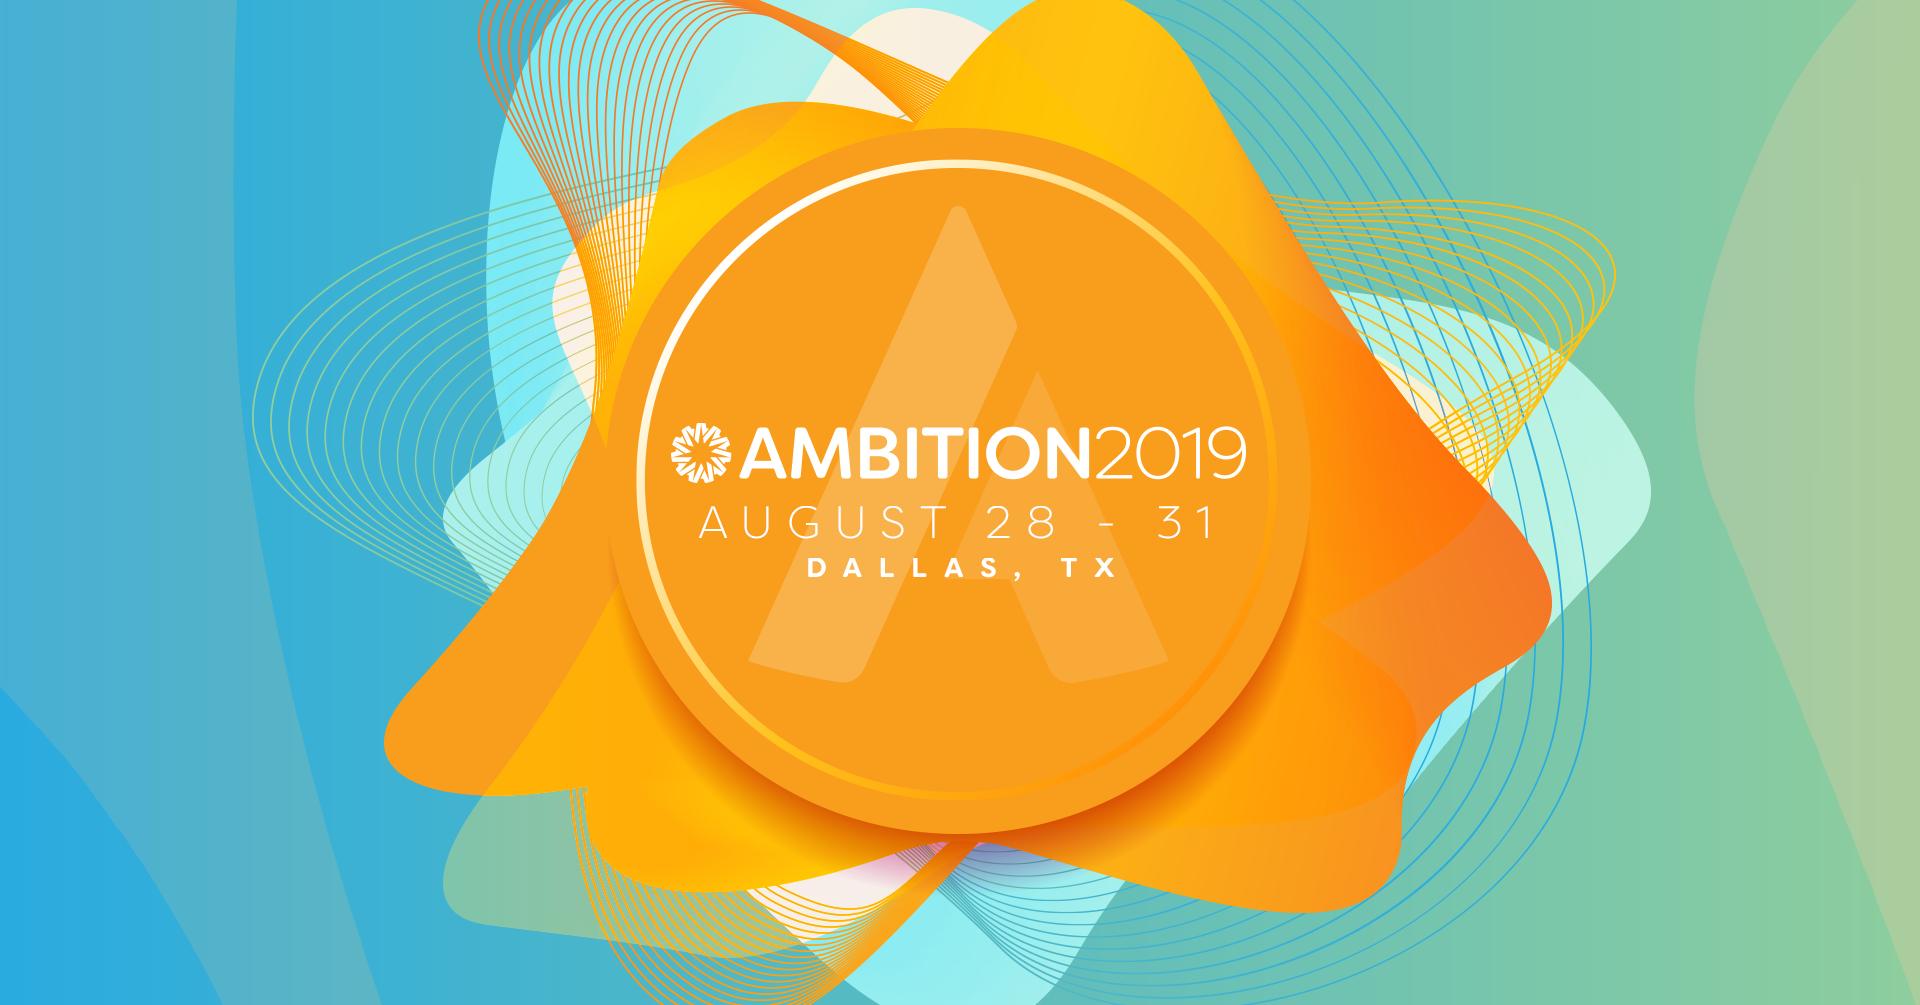 AMBITION 2019 Recap